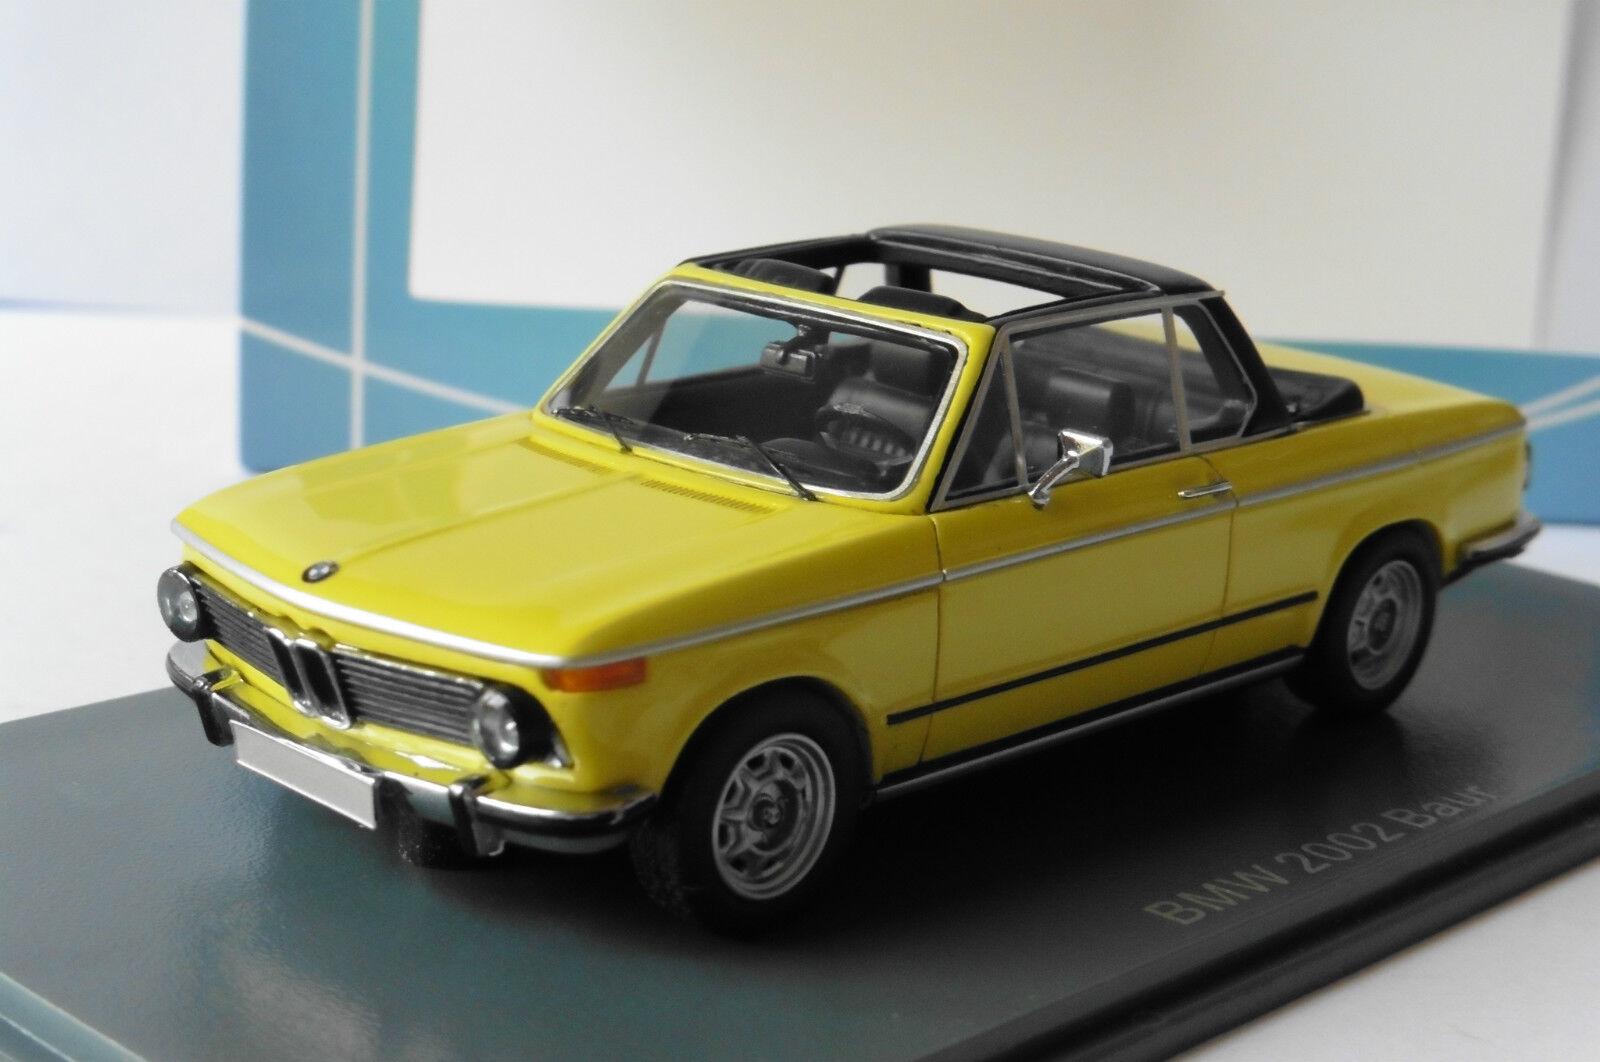 BMW 2002 E10 BAUR ROADSTER YELLOW NEO 43284 1 43 CABRIOLET GELB JAUNE LHD